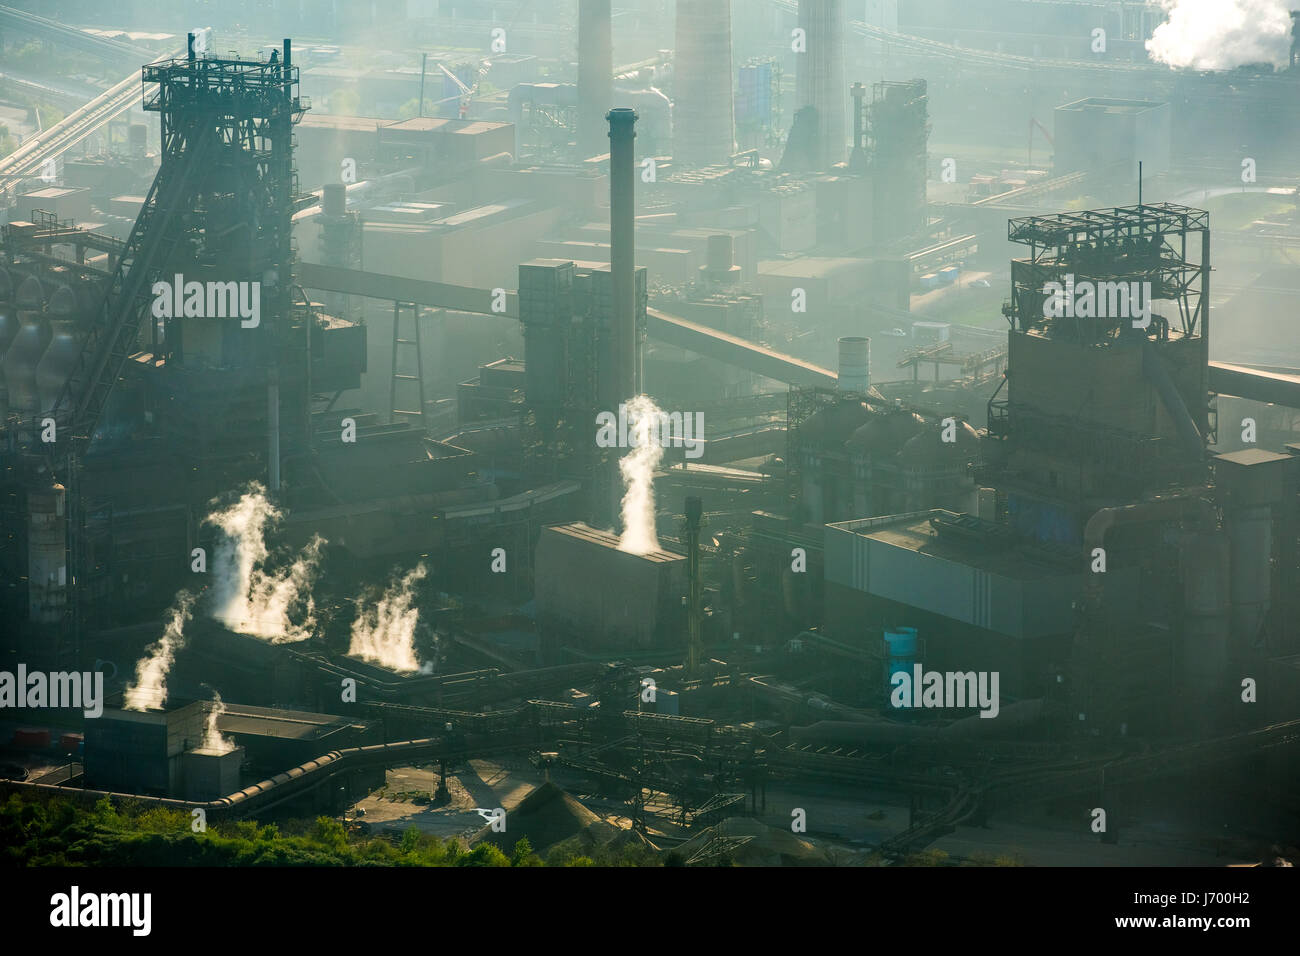 Steelworks ThyssenSteel, steel industry, heavy industry, mining industry, air pollution, emissions, chimneys, Rhine - Stock Image